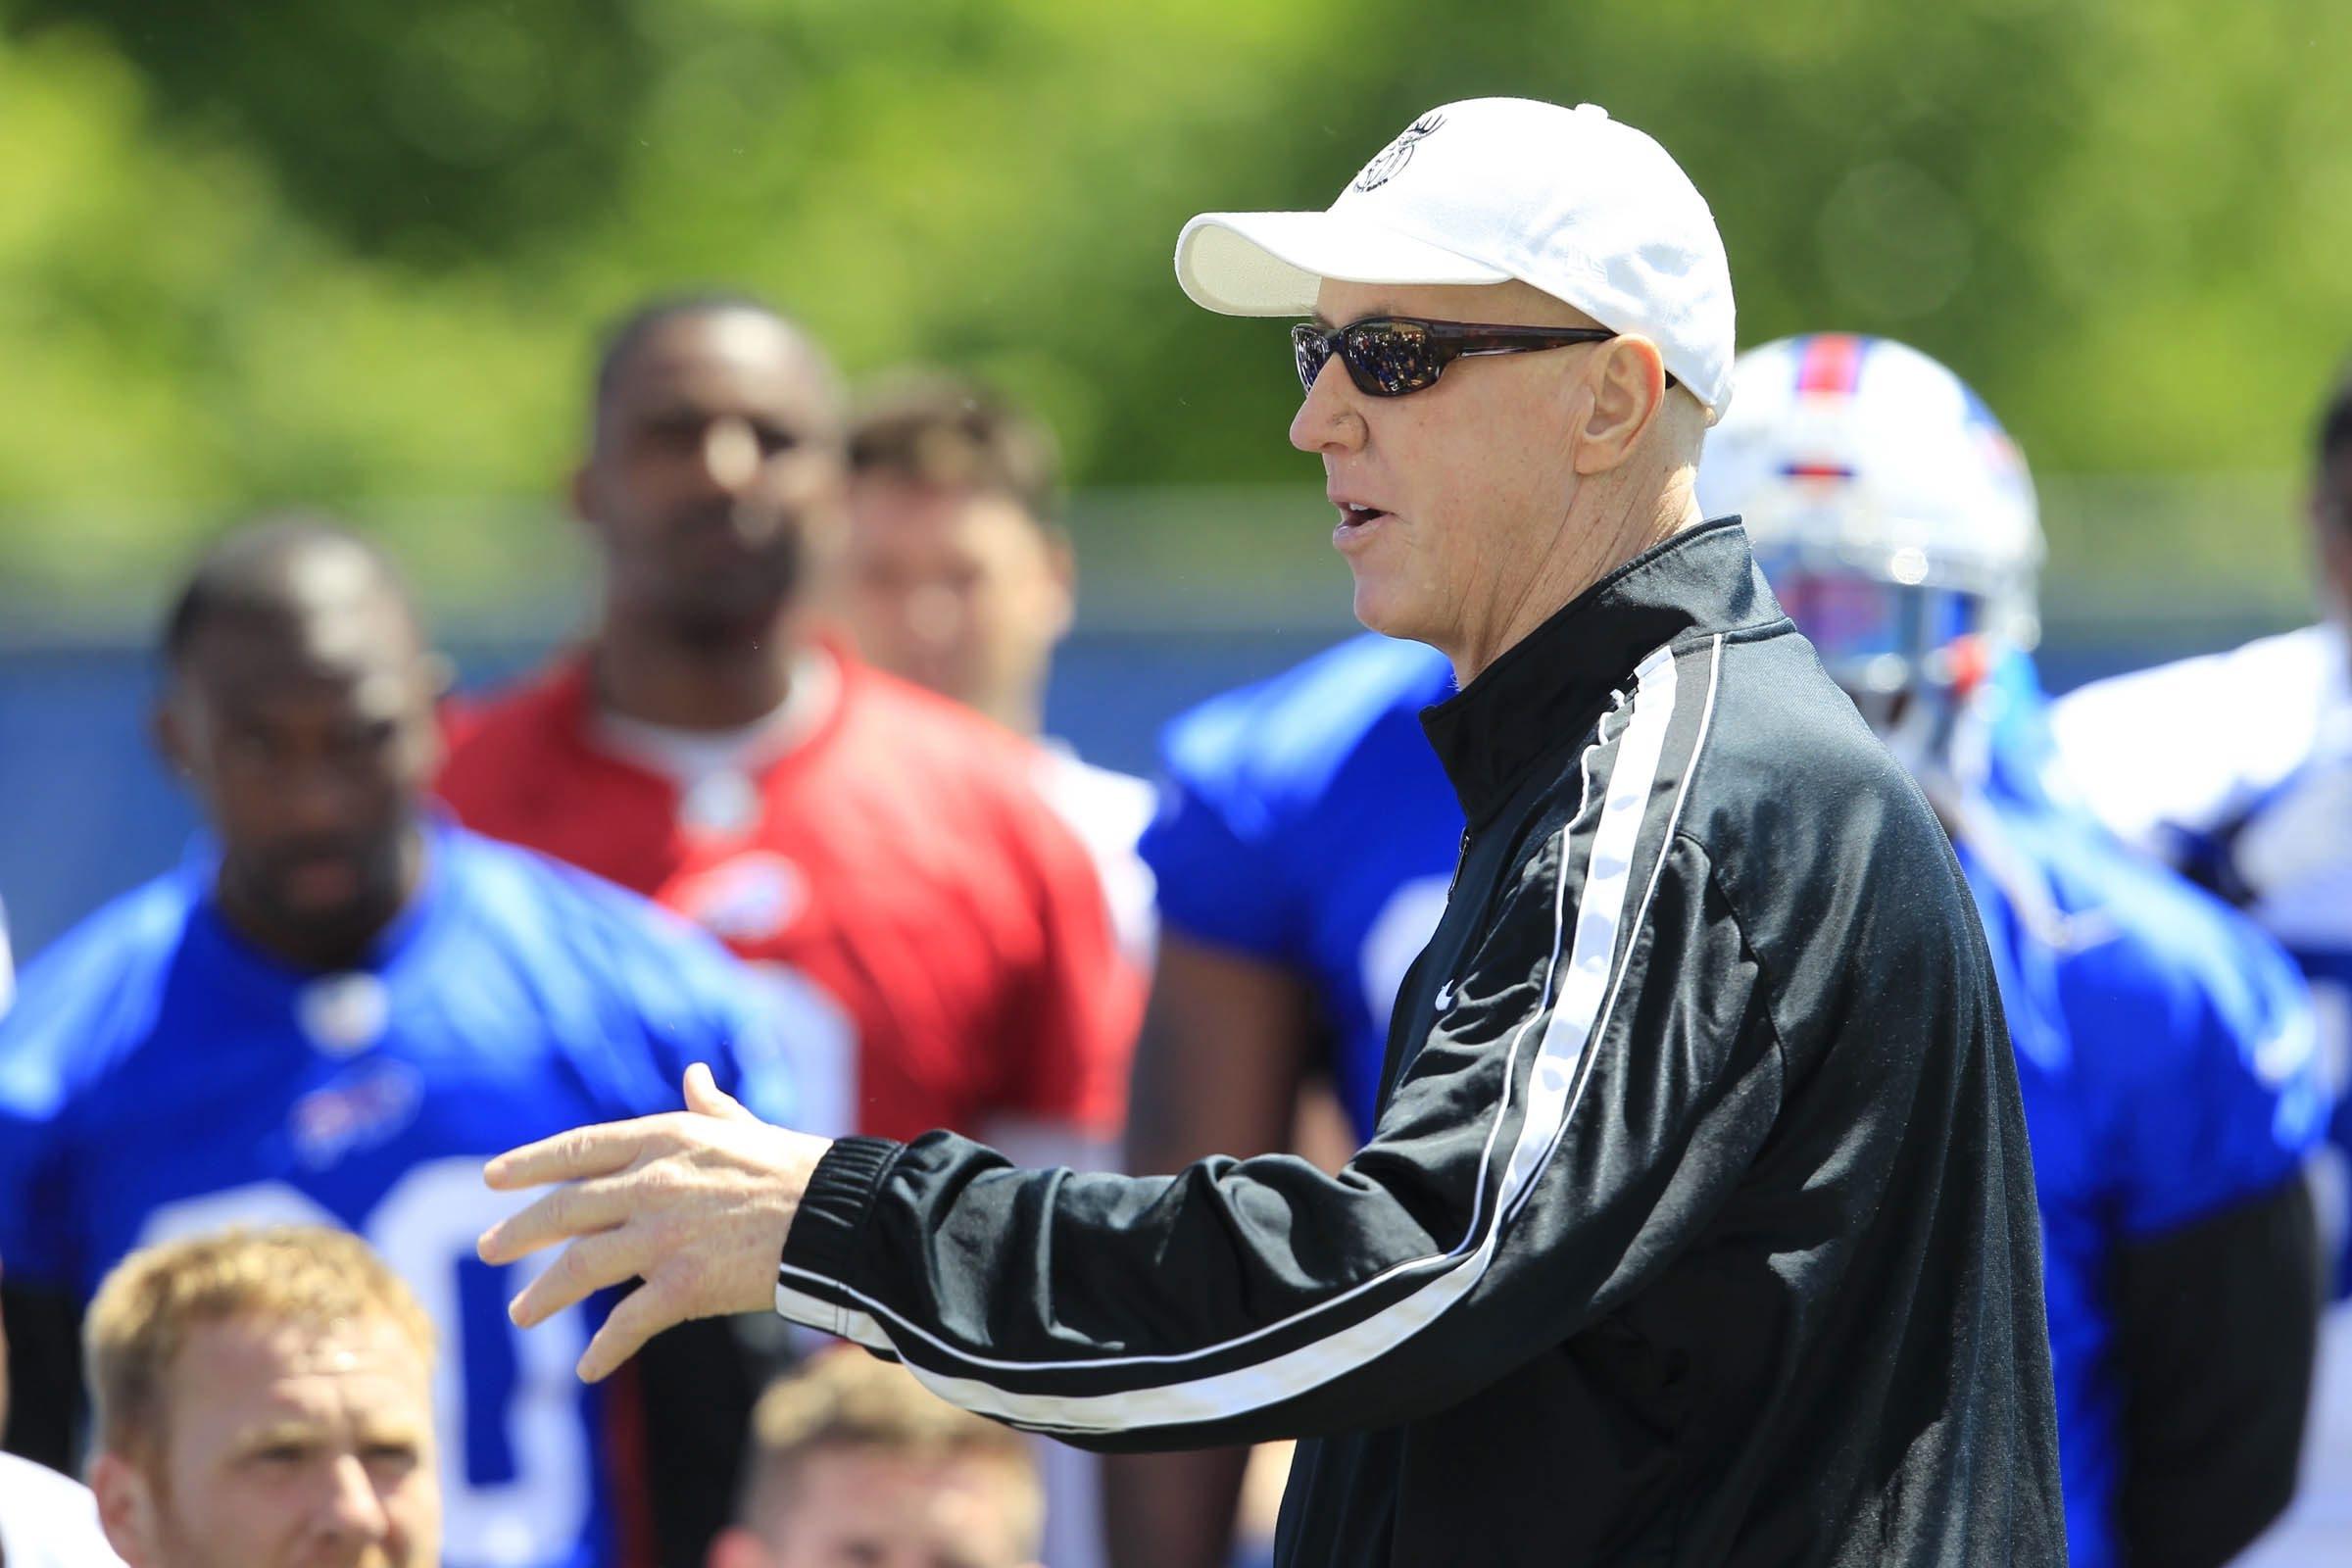 Bills Hall of Fame quarterback Jim Kelly addresses the current team during minicamp in Orchard Park on June 19.